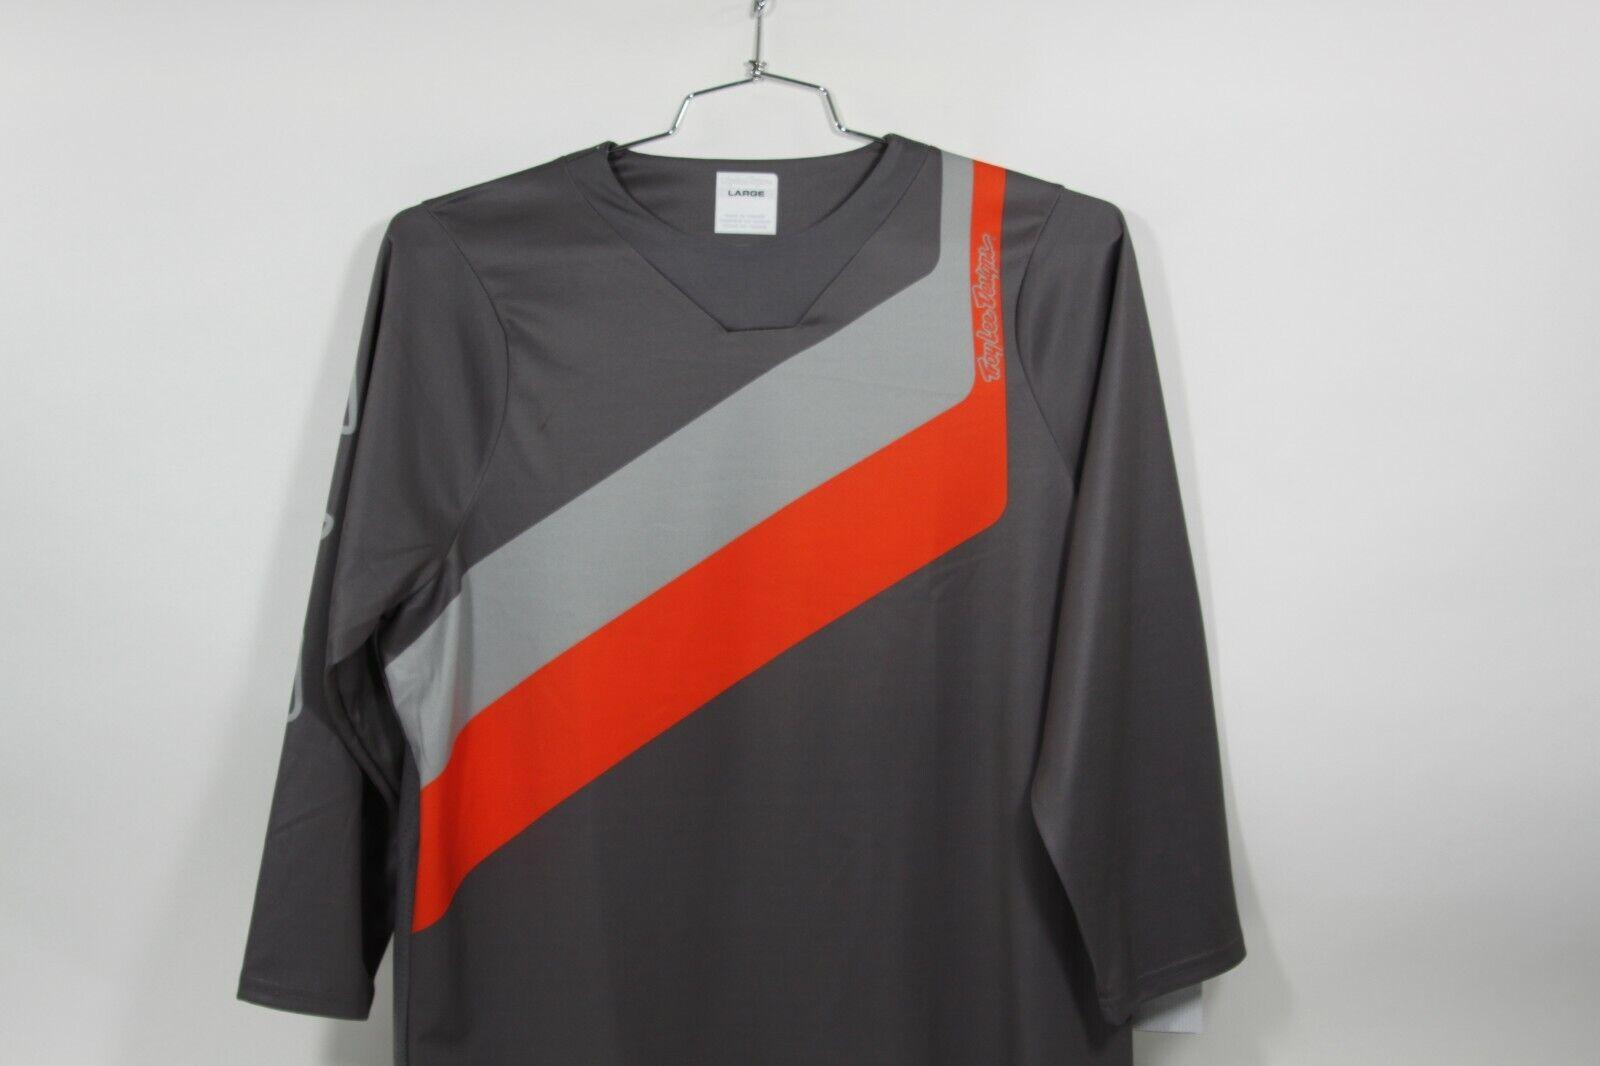 2019 Troy Lee Designs Ruckus 34 sleeve jersey Diuominiione gree rossogrigio